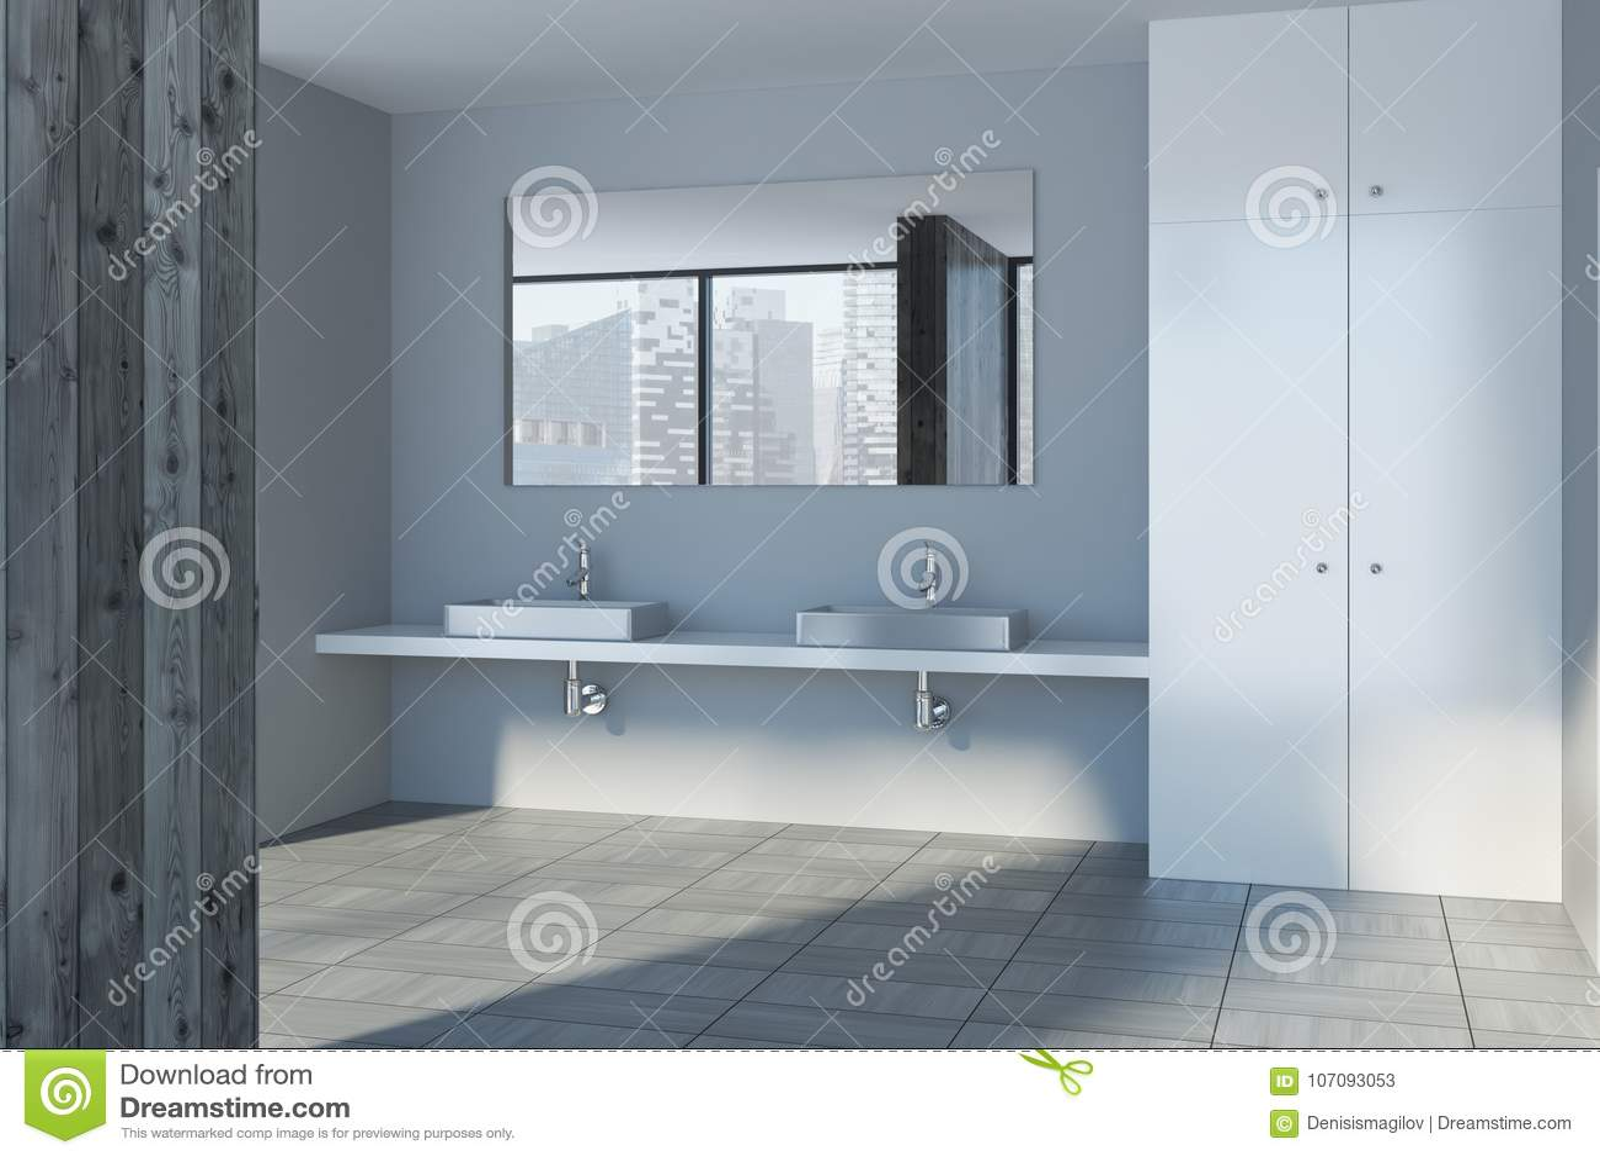 Wooden Bathroom Interior, Double Sink Stock Illustration ...